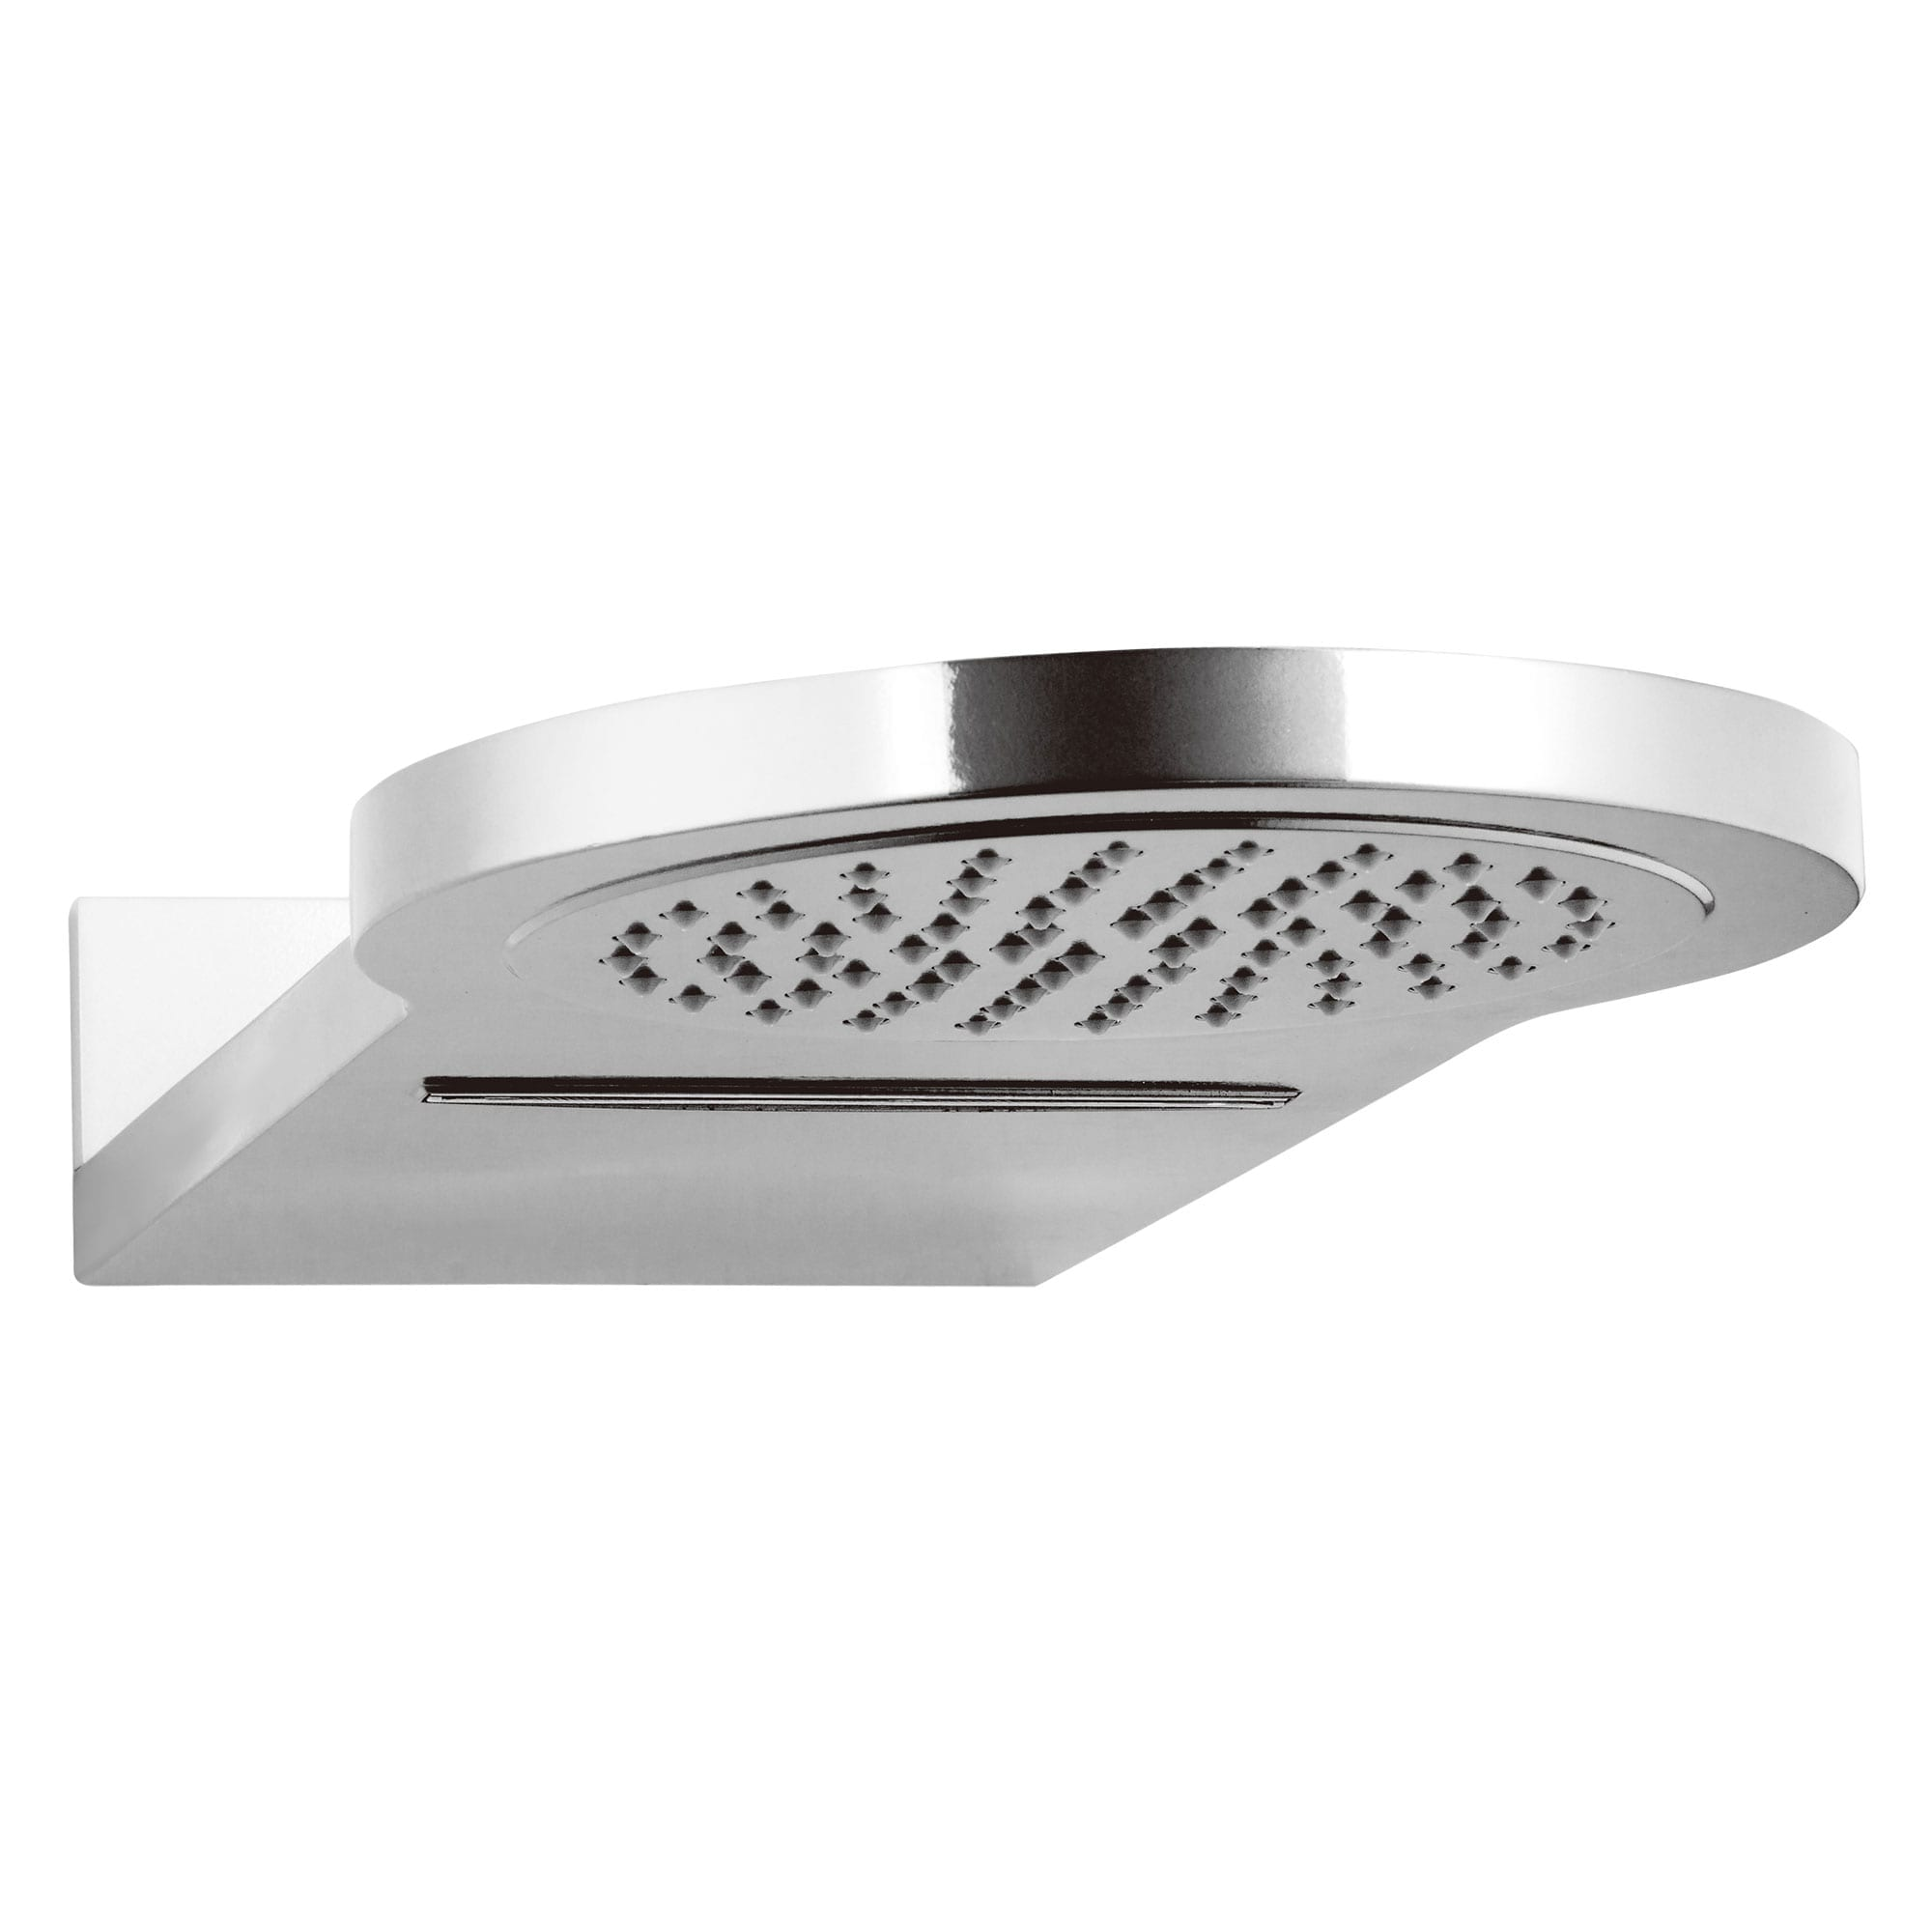 symmons handheld home shower improvement reviews pdx complete origins wayfair system head waterfall